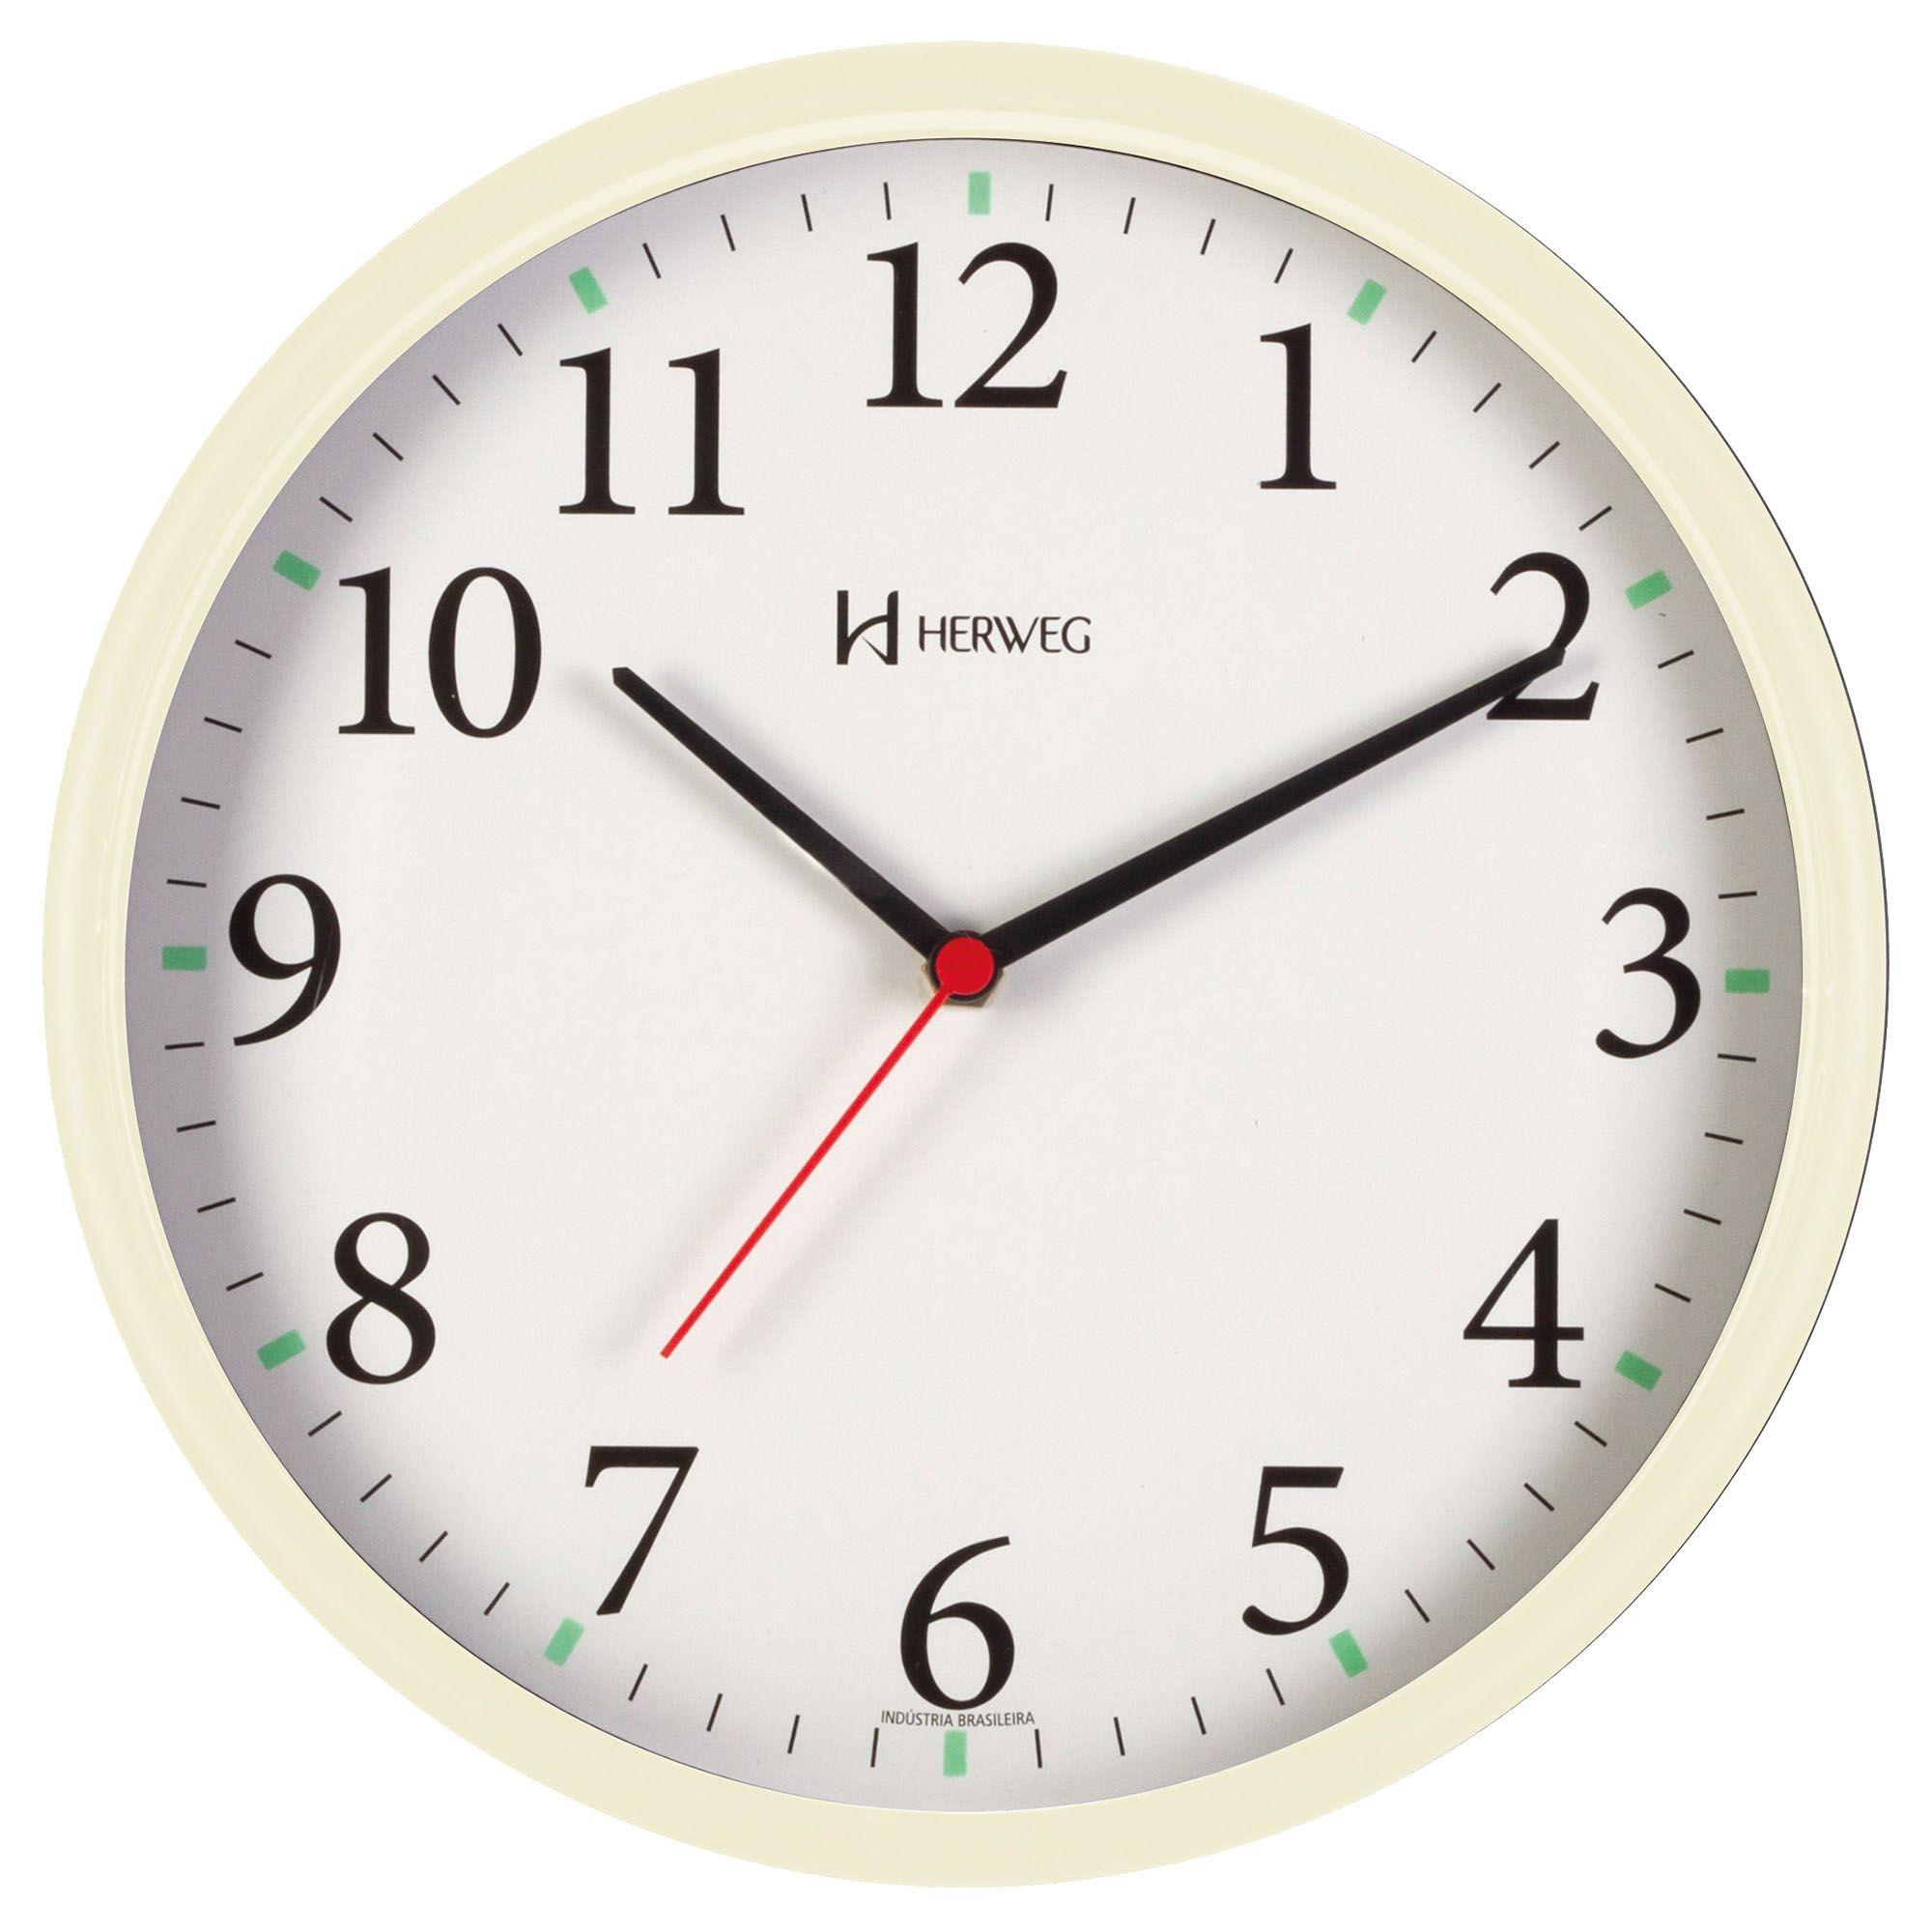 Relógio de Parede Analógico Herweg 660022 032 Marfim